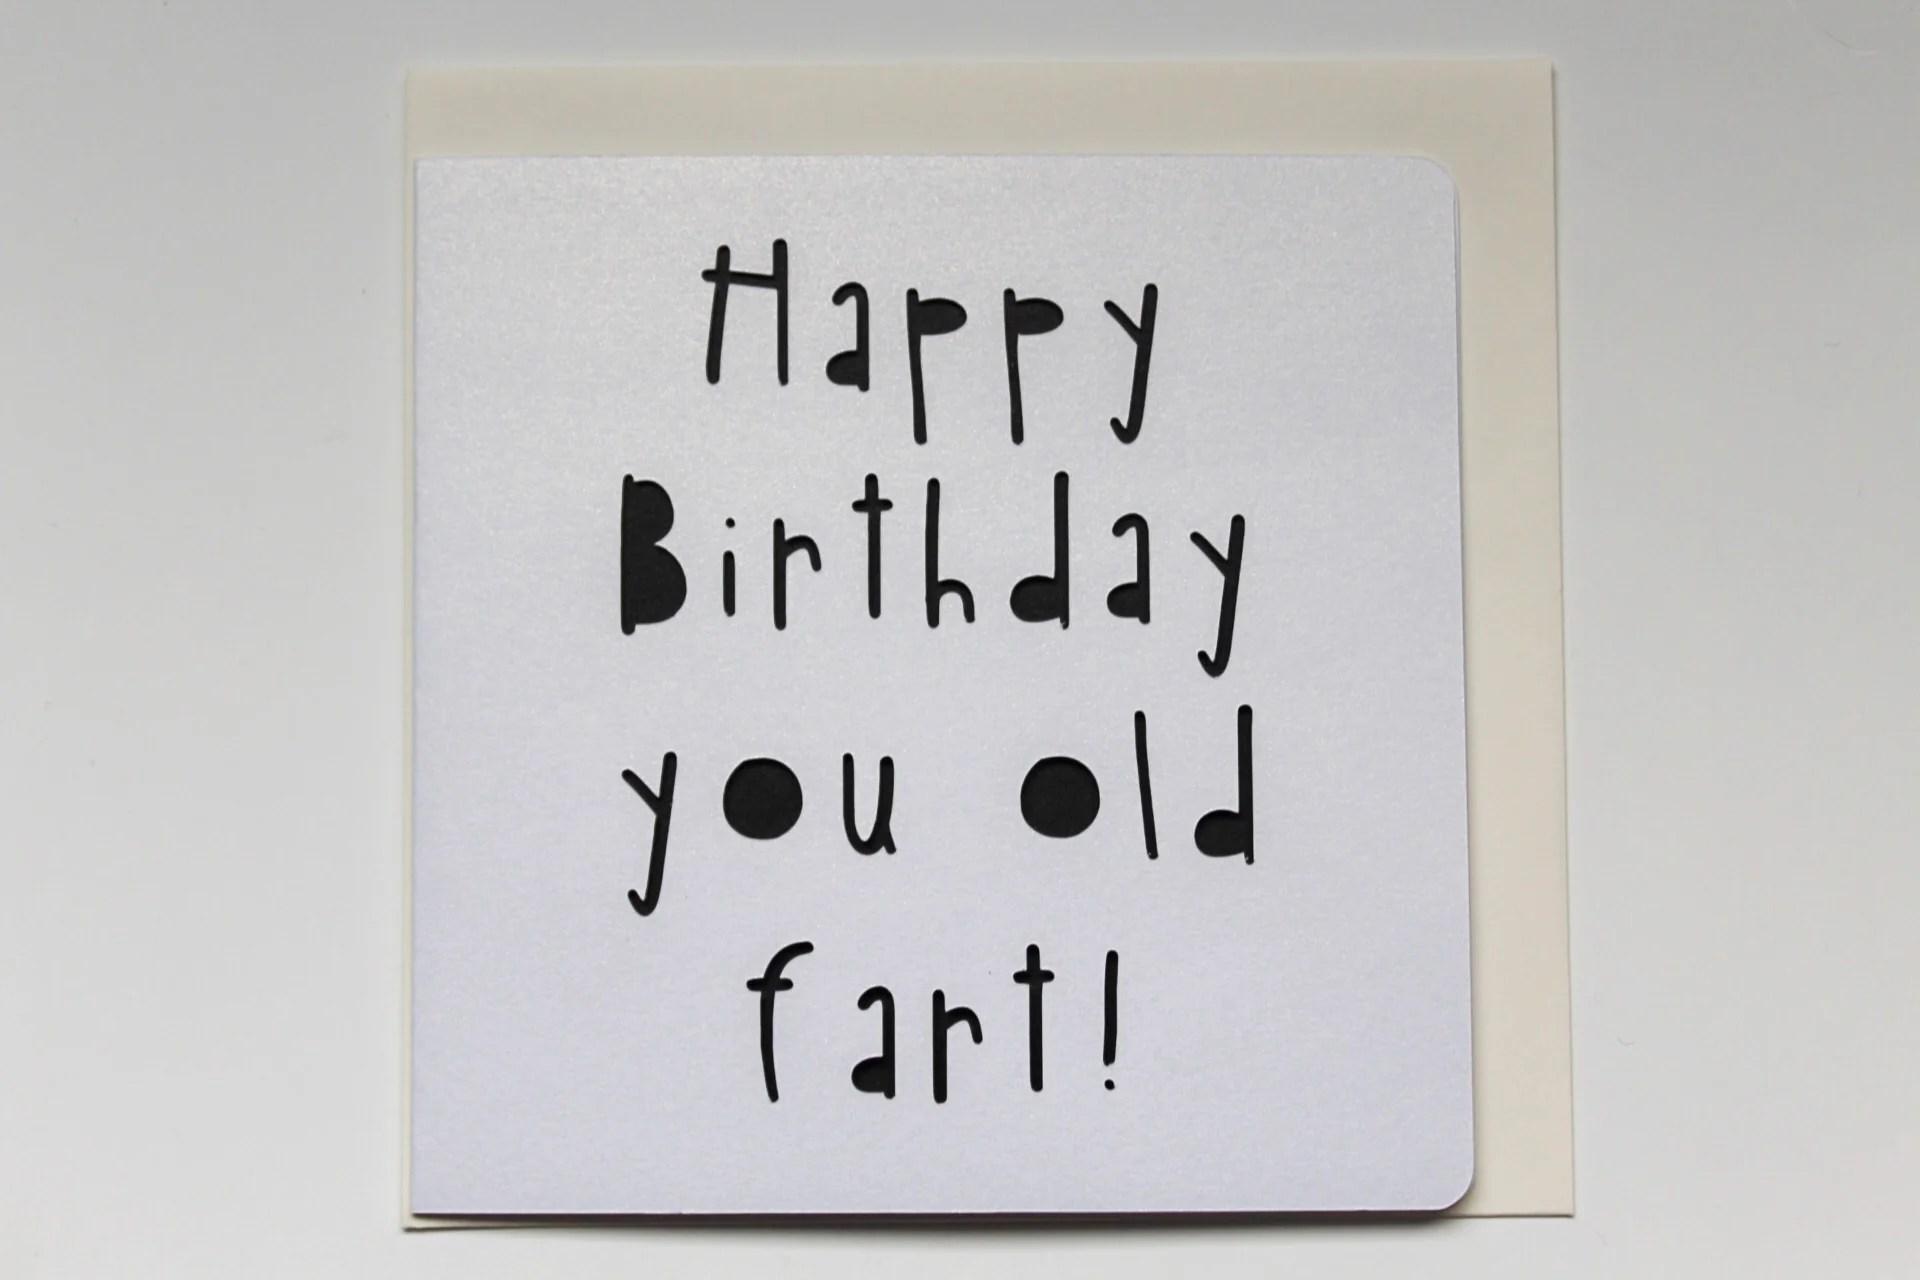 Charm Happy Birthday Fart Card Happy Birthday Fart Card Room Happy Birthday Er Sister Ny Happy Birthday Fart gifts Happy Birthday Old